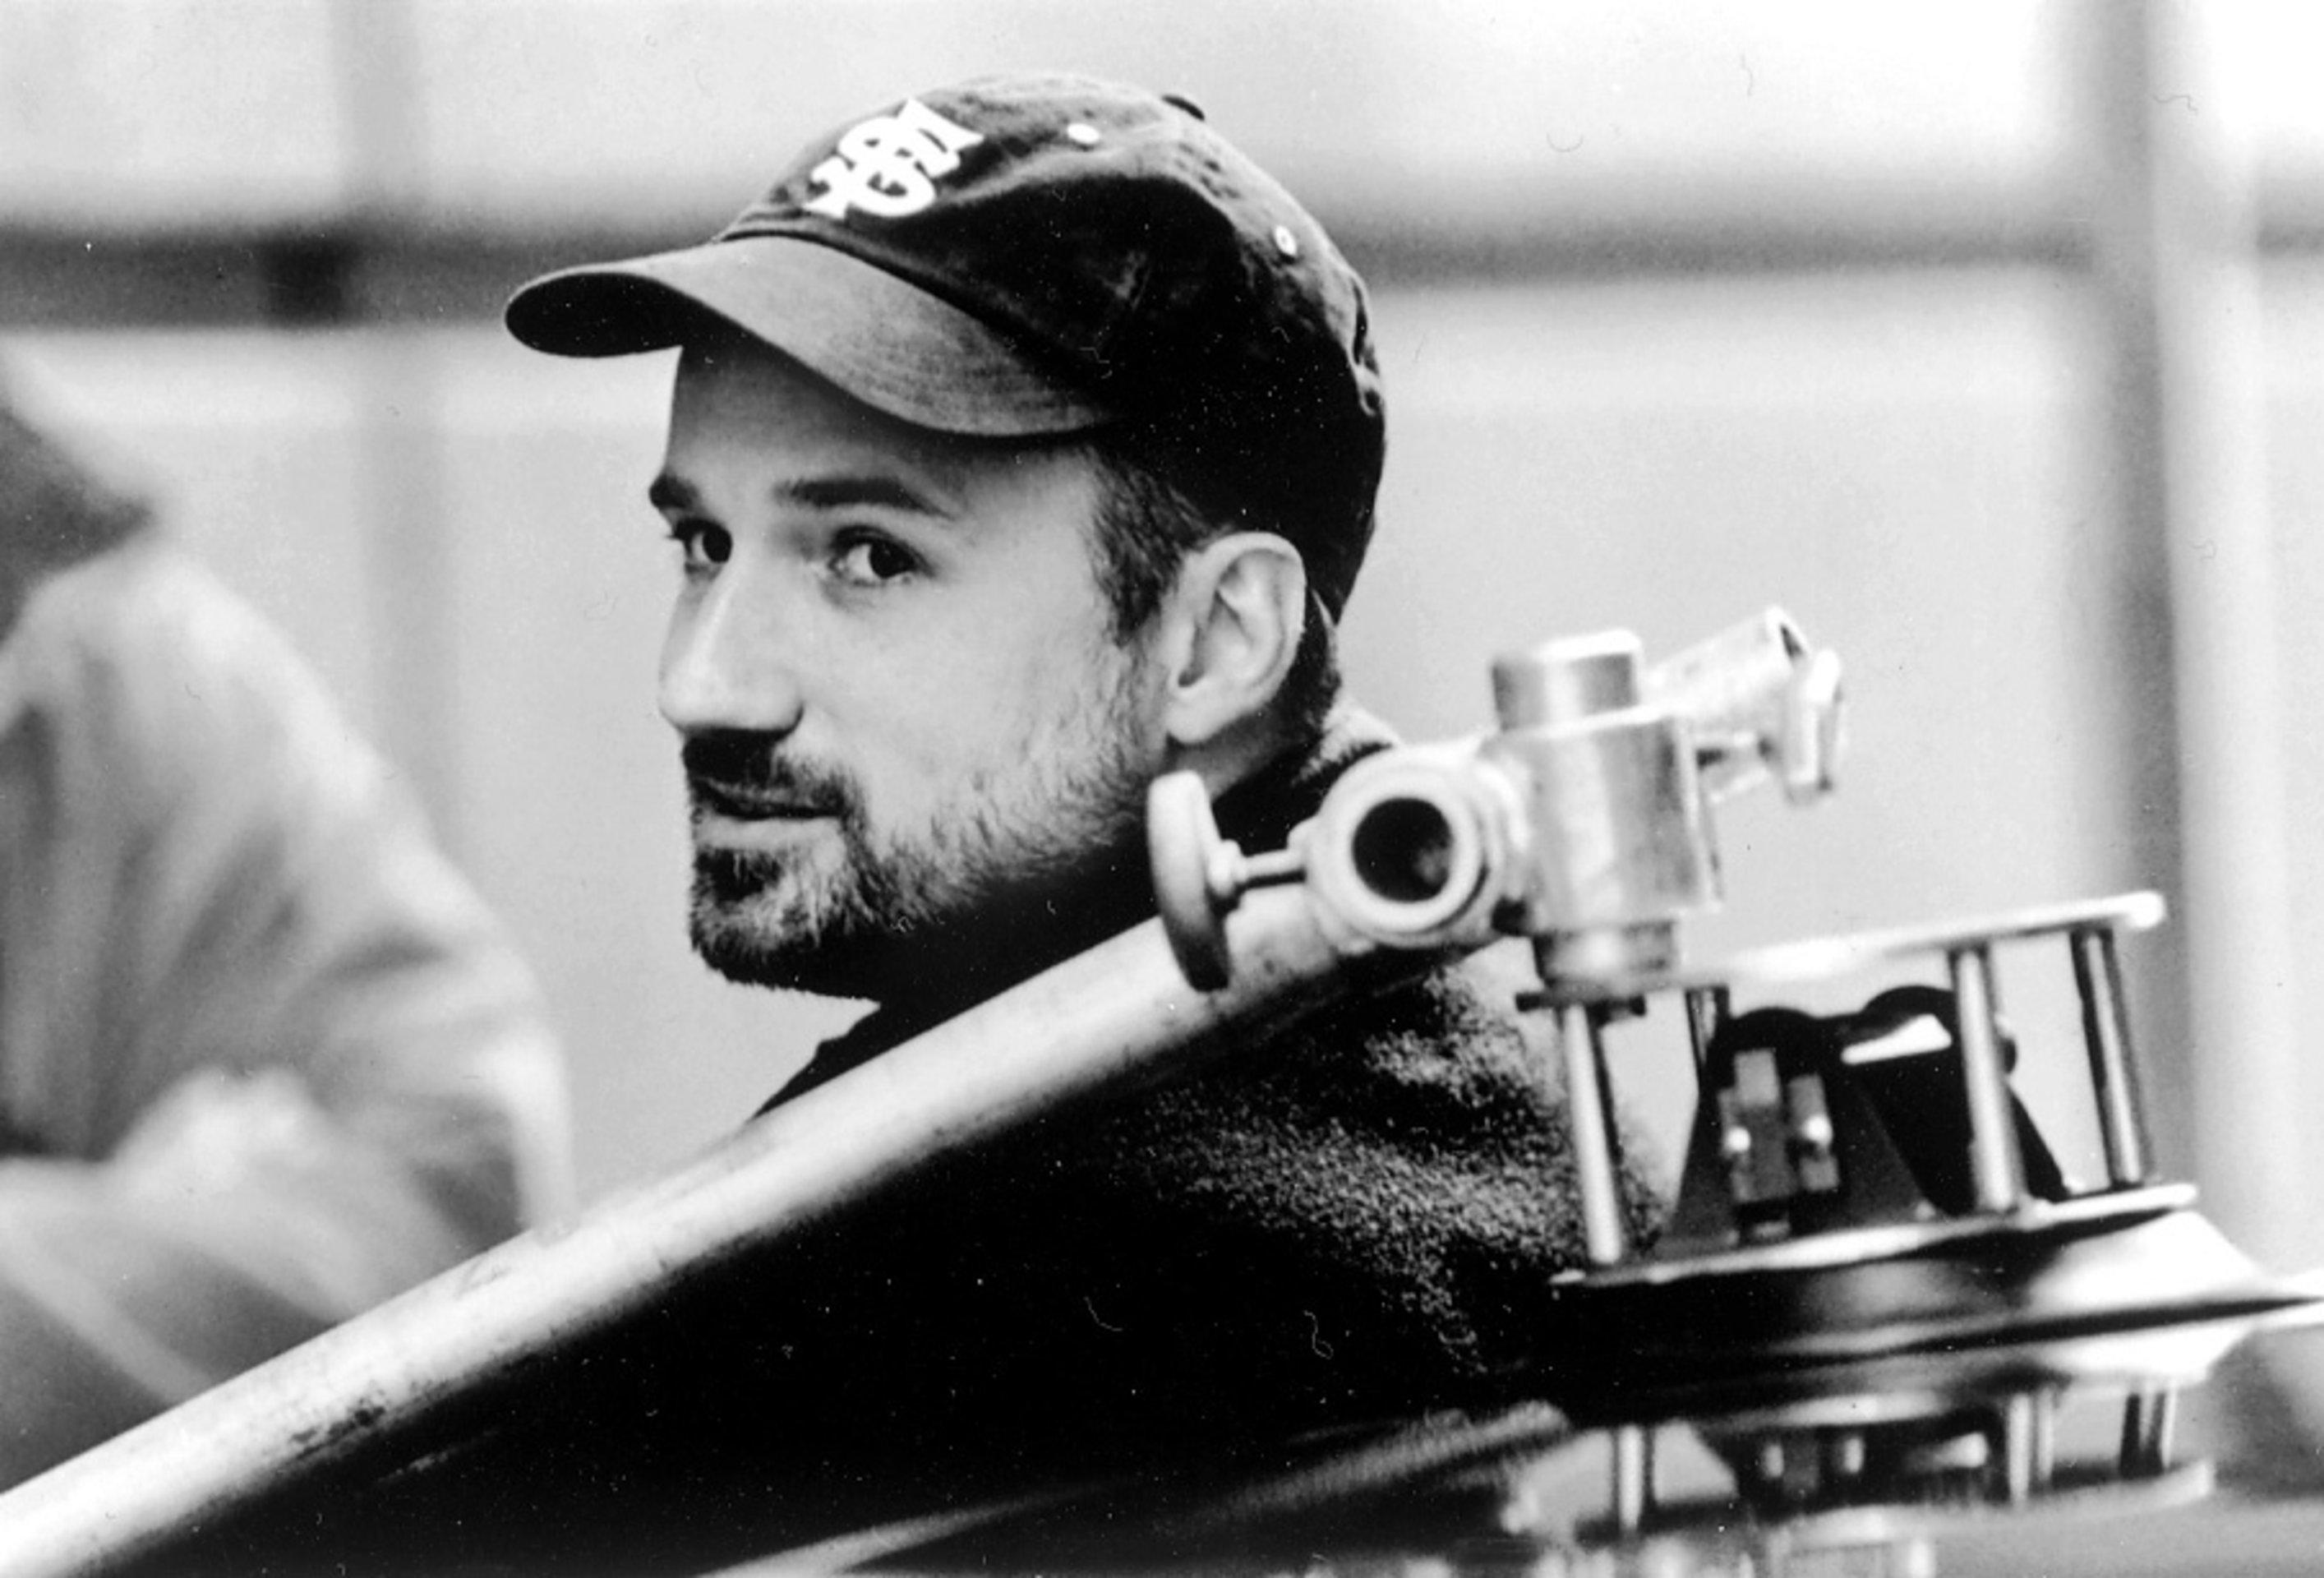 Game, The / <b>David Fincher</b> / Set Poster - game-the-david-fincher-set-1-rcm0x1920u